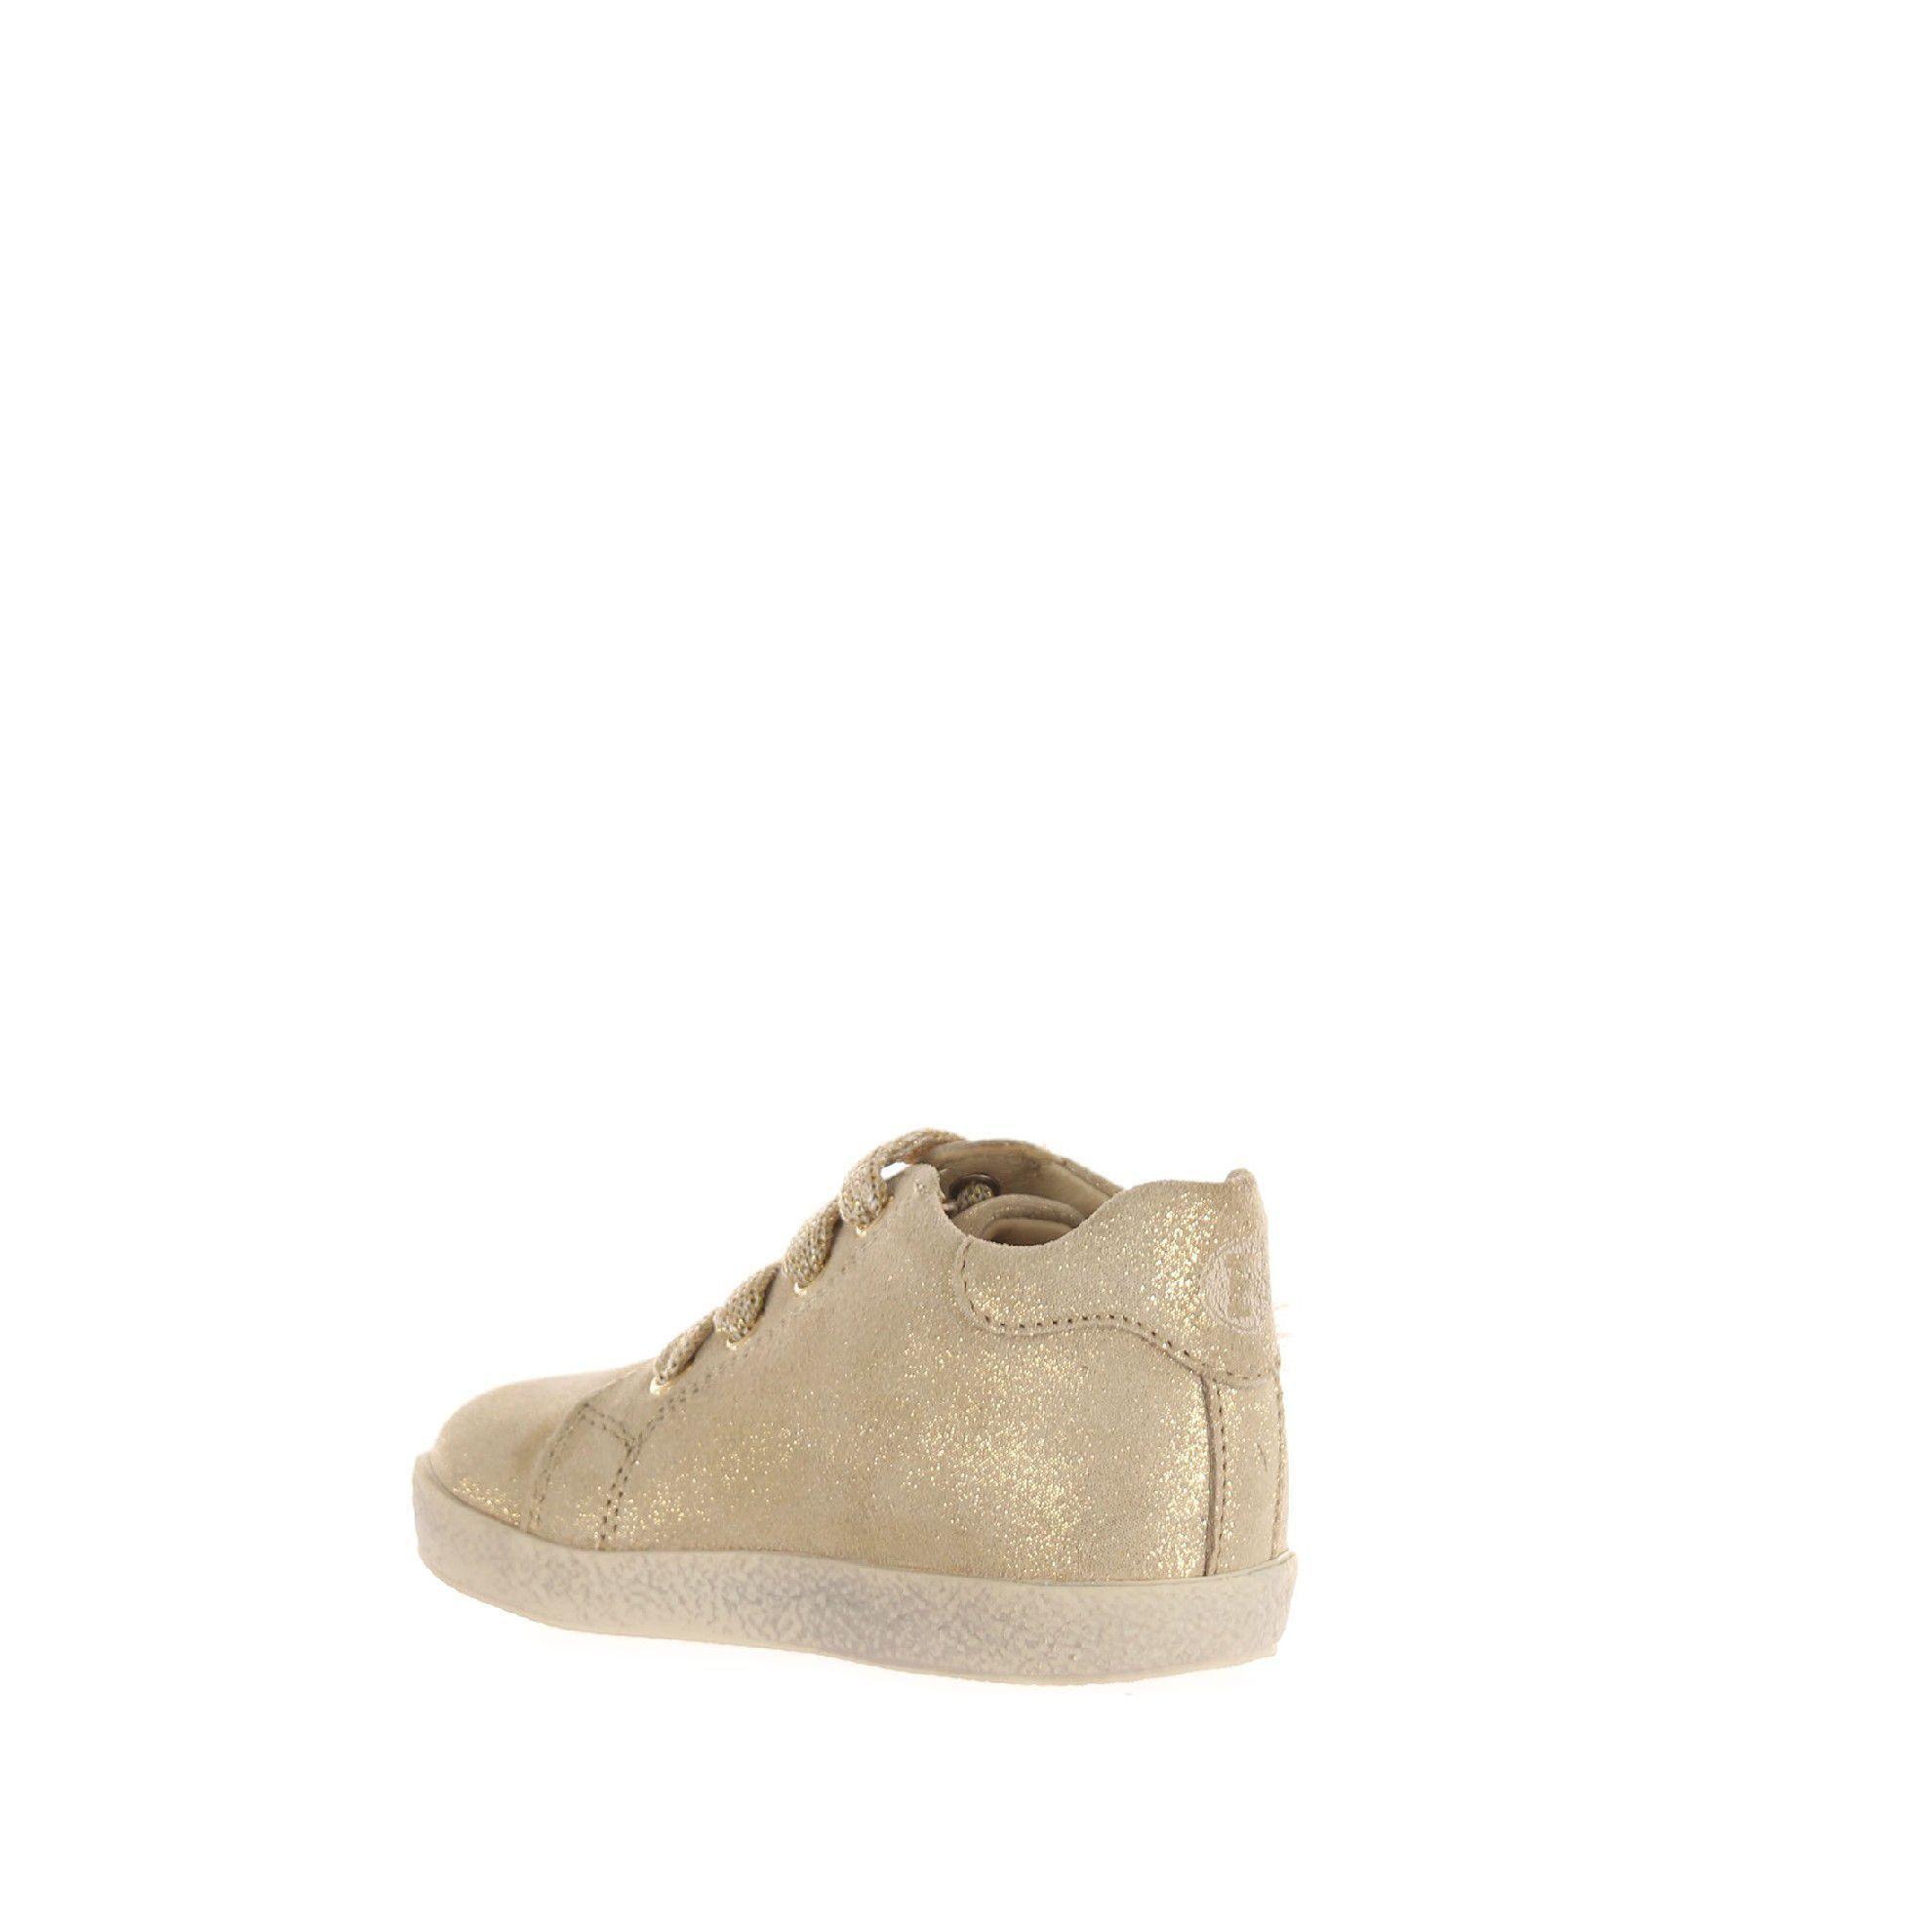 Falcotto sneaker in suede shiny da bambina